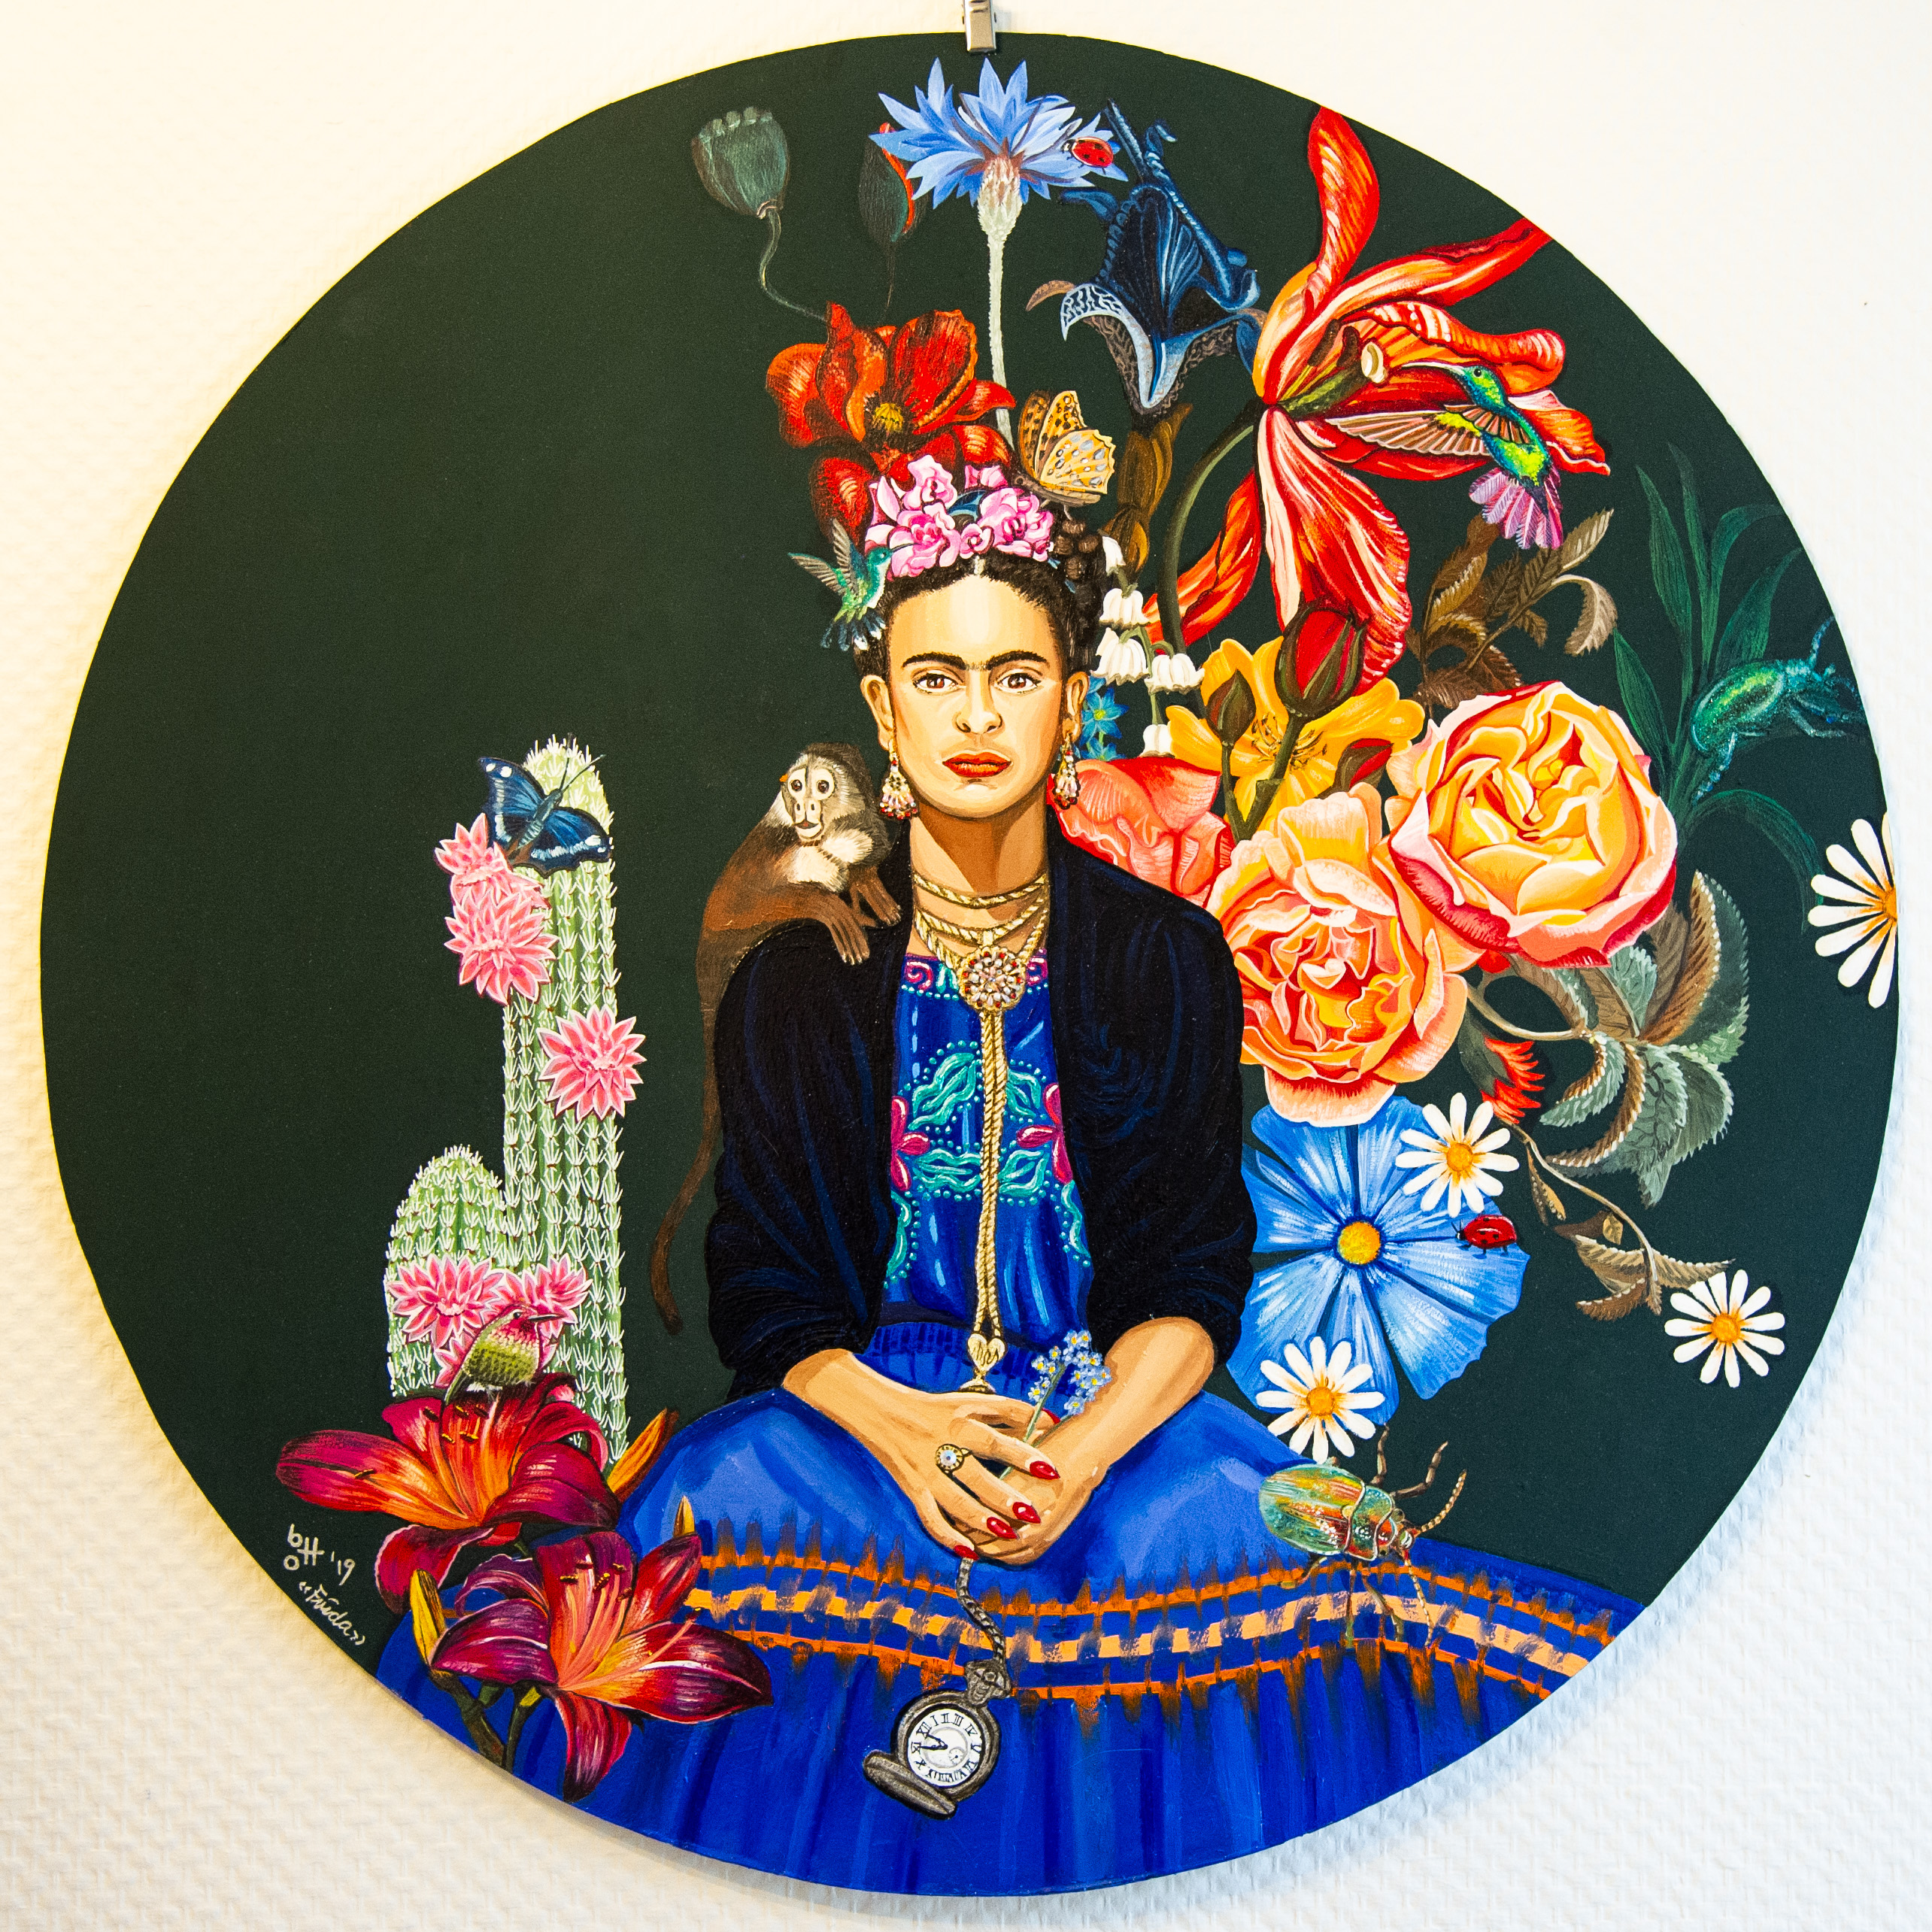 Hommage à Frida